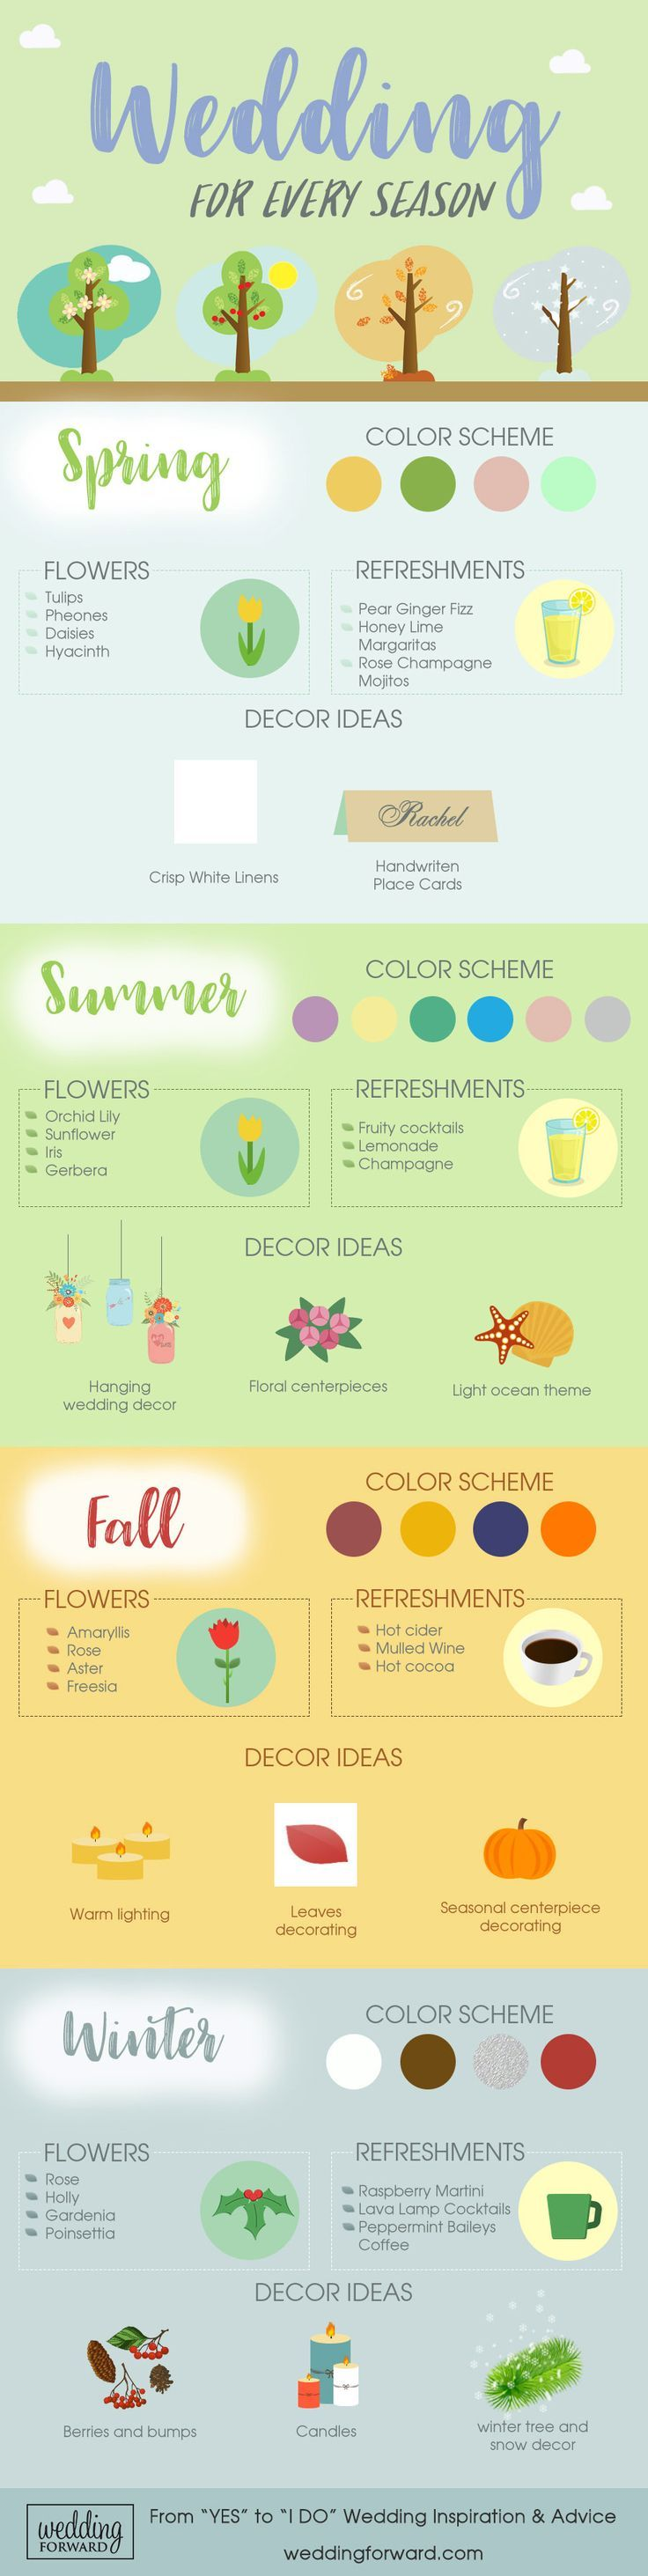 363 best Wedding Planning Tips images on Pinterest Wedding tips